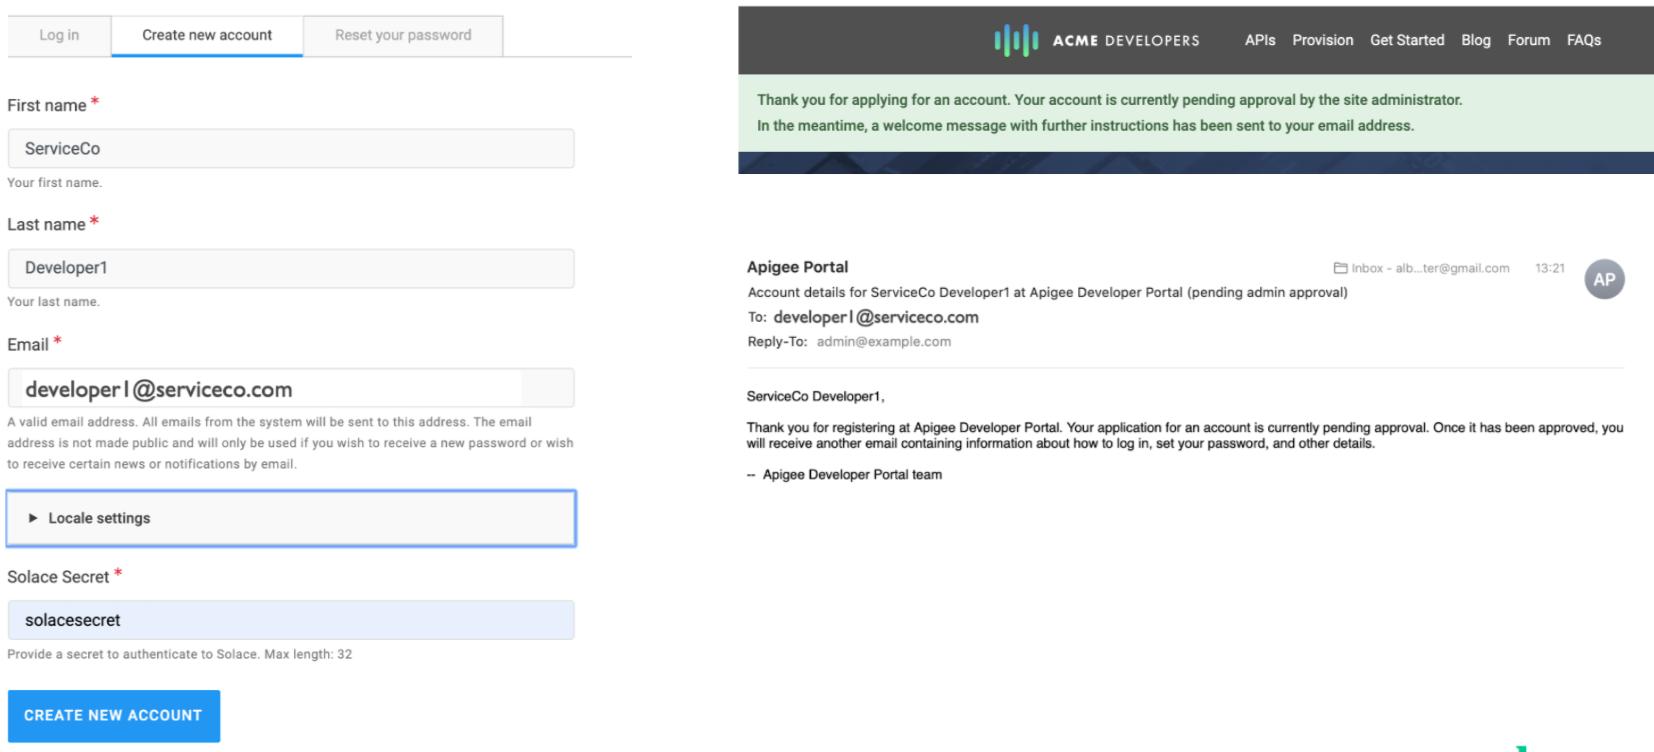 apigee developer portal